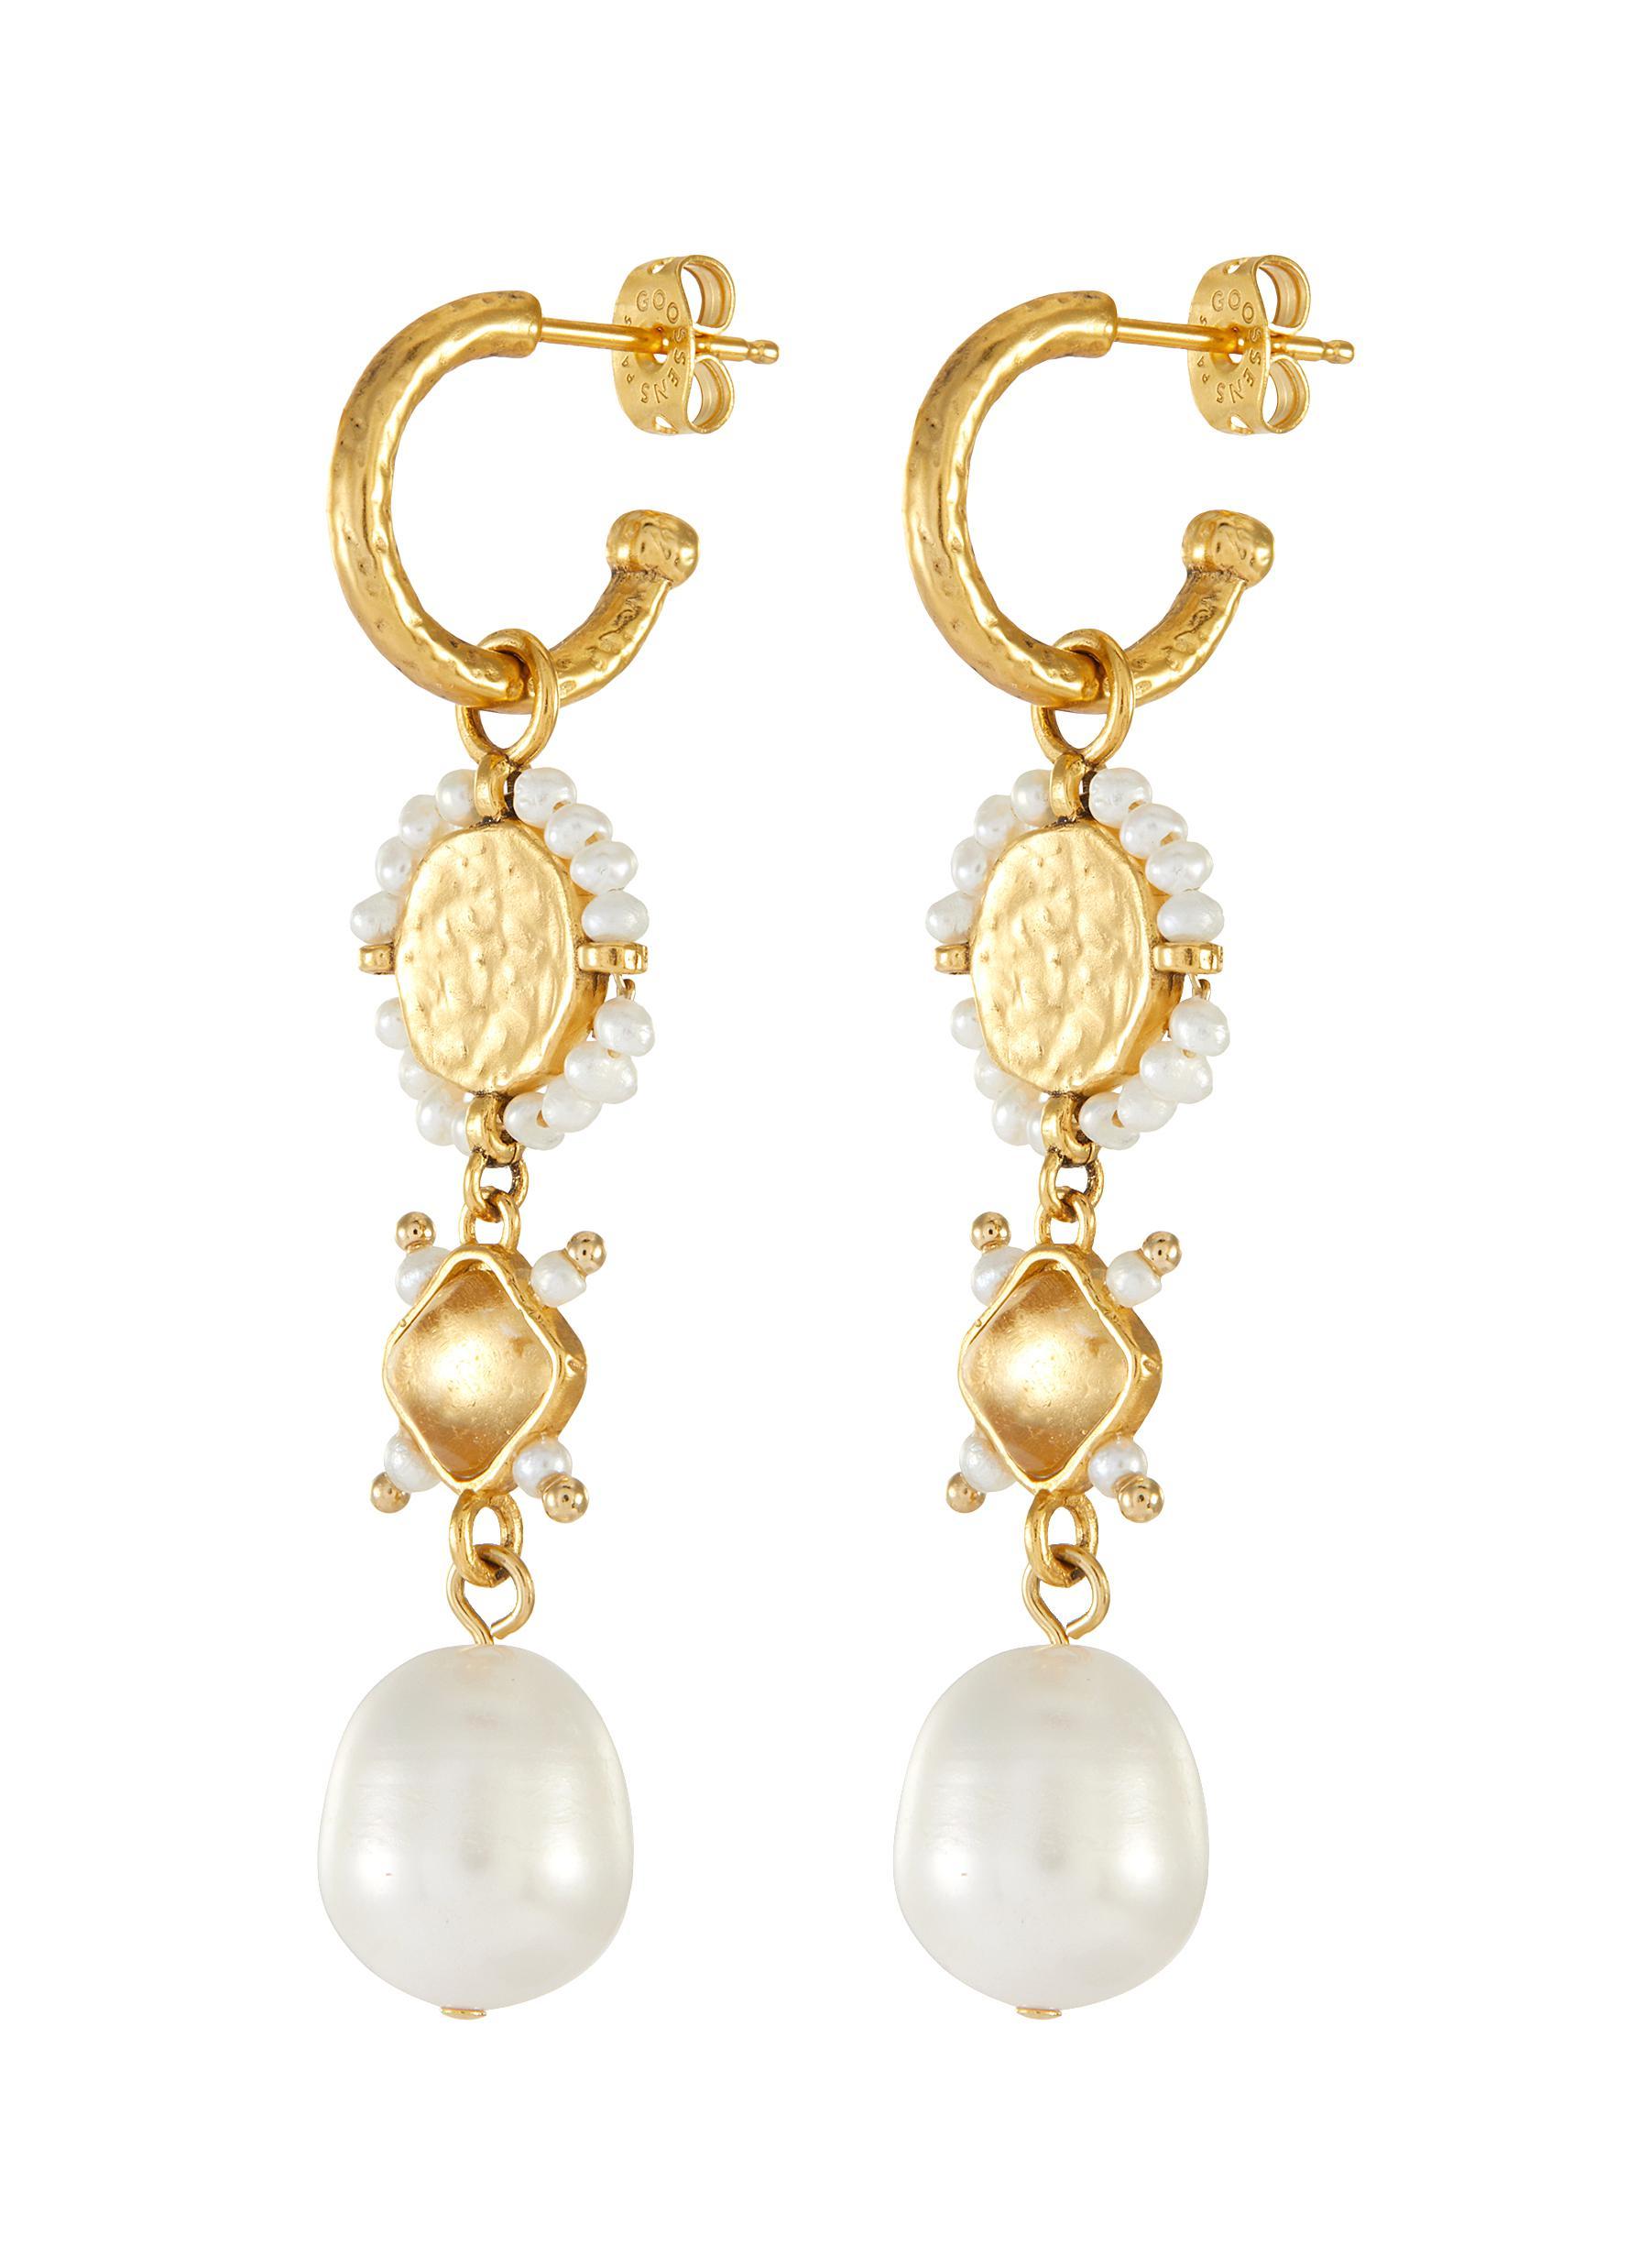 Pearl embellished drop earrings